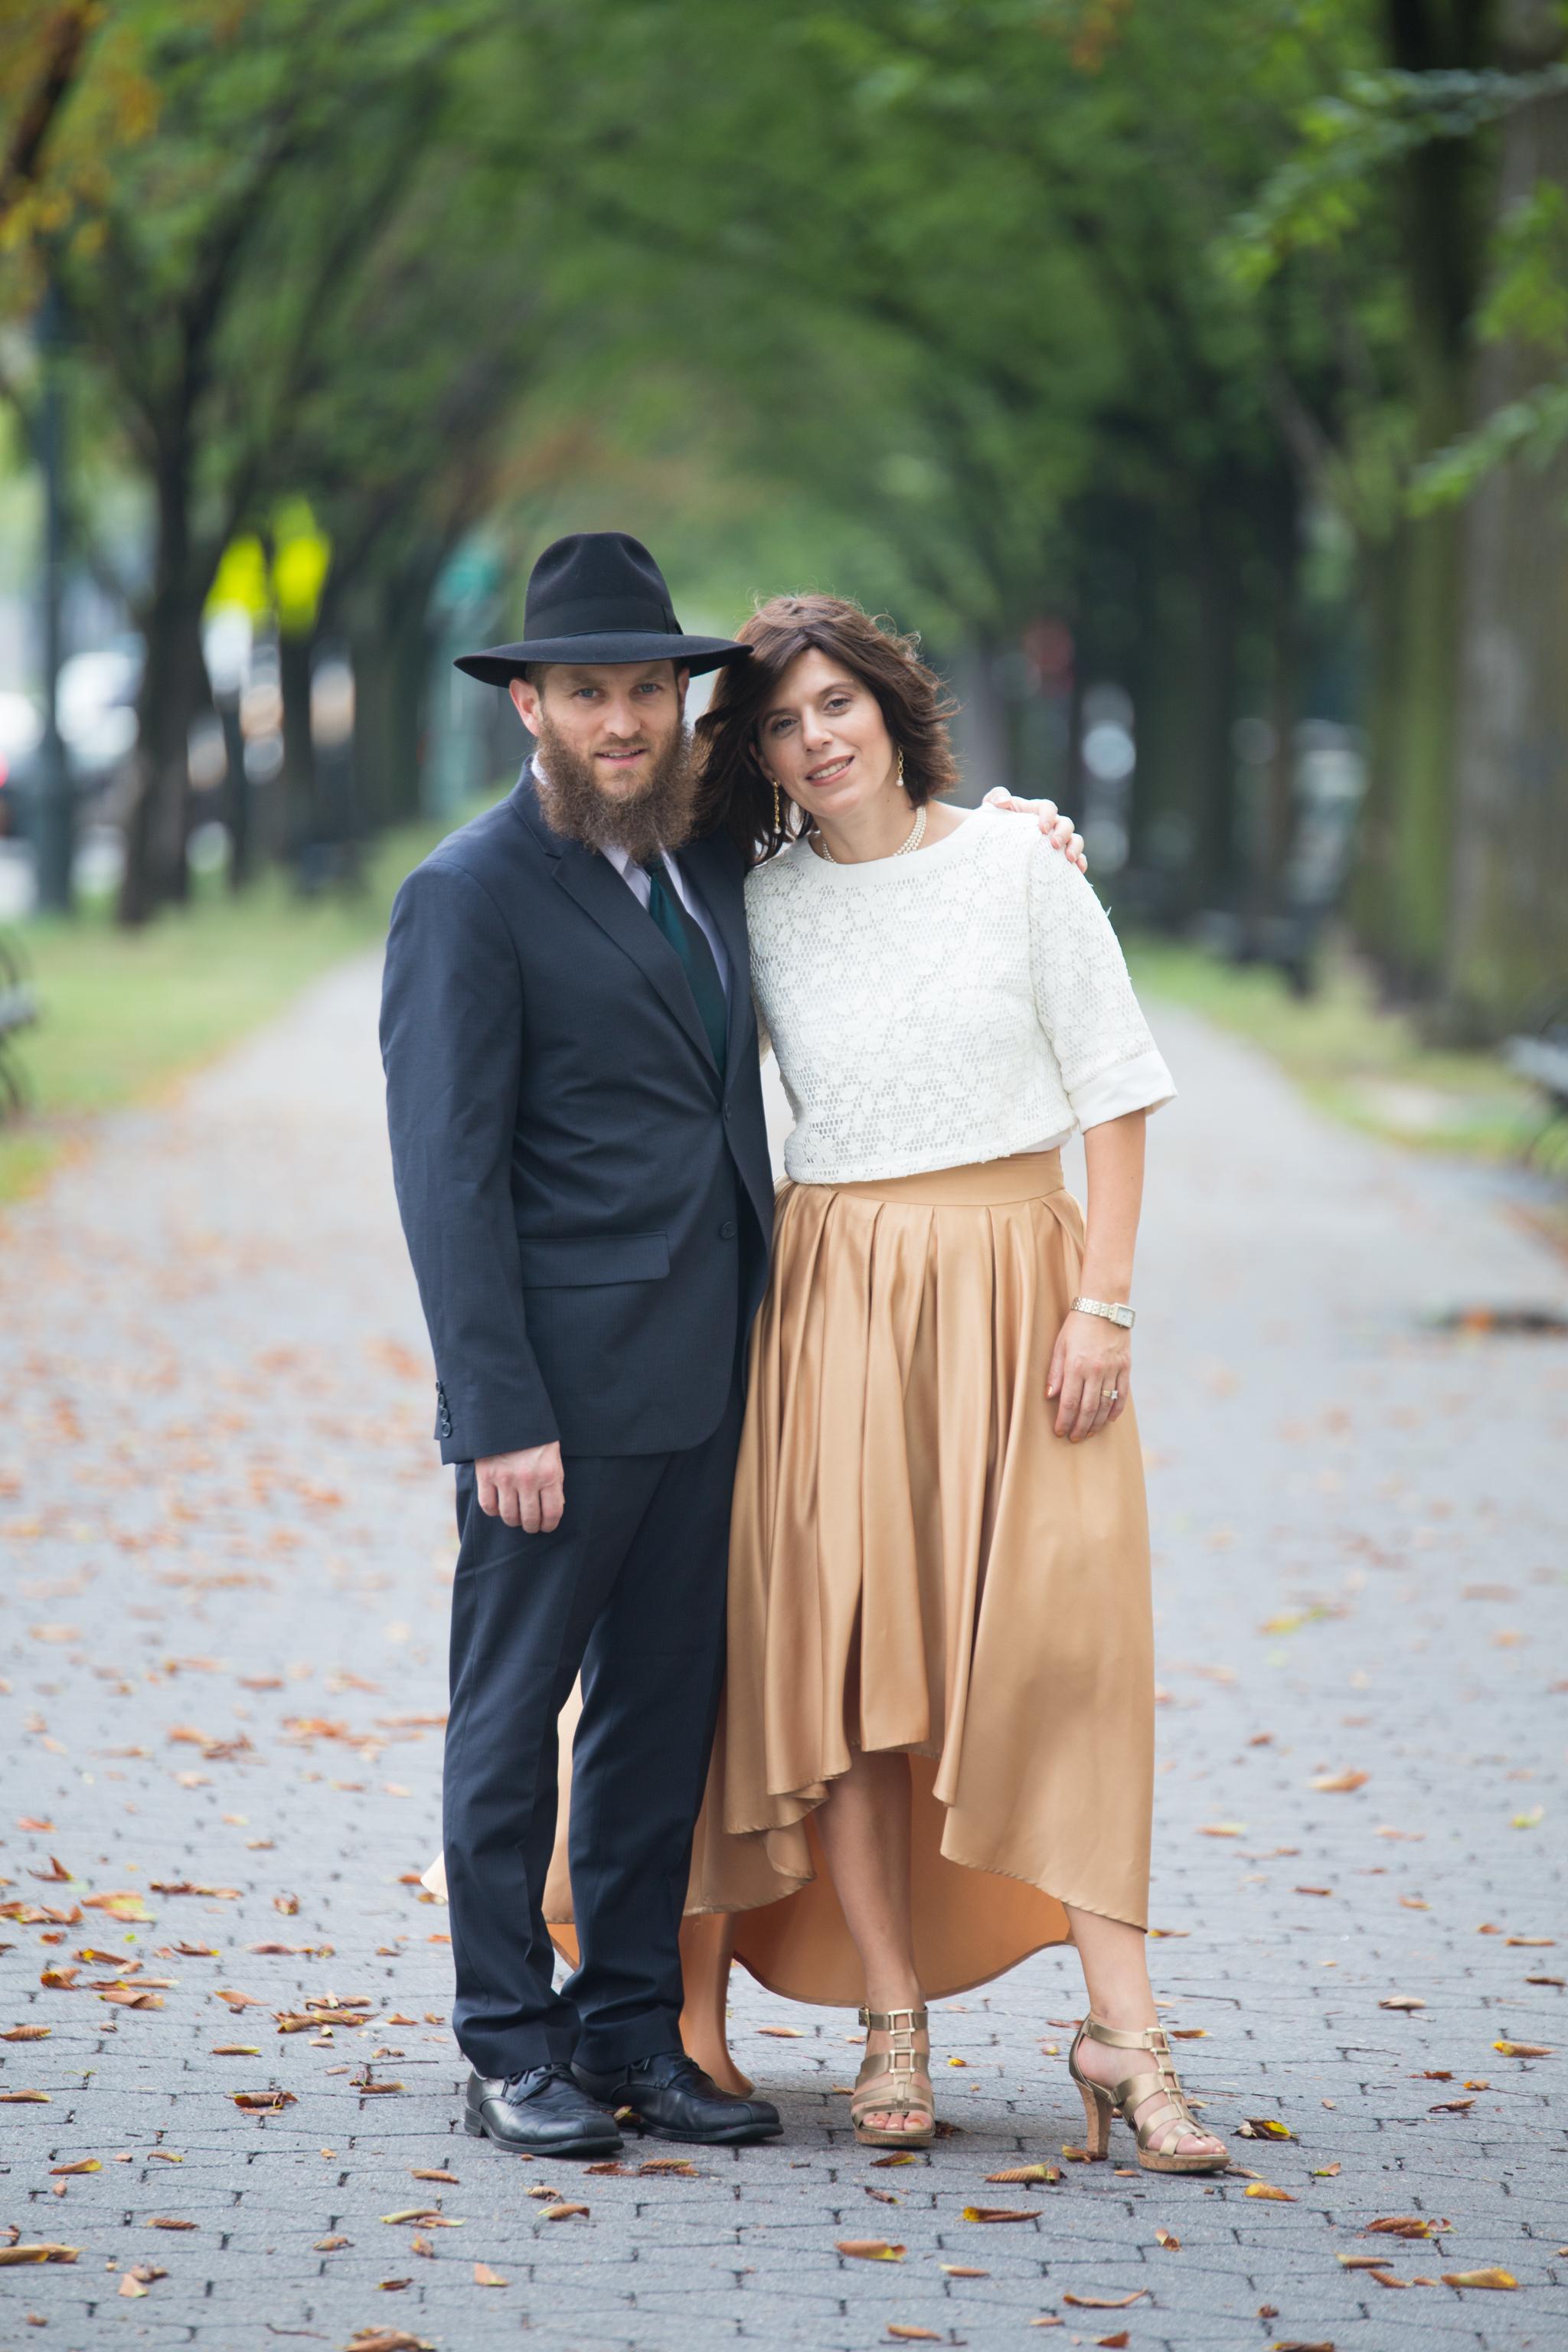 Bar Mitzvah Meir Sandman - photography, new york, events, people -0122.jpg